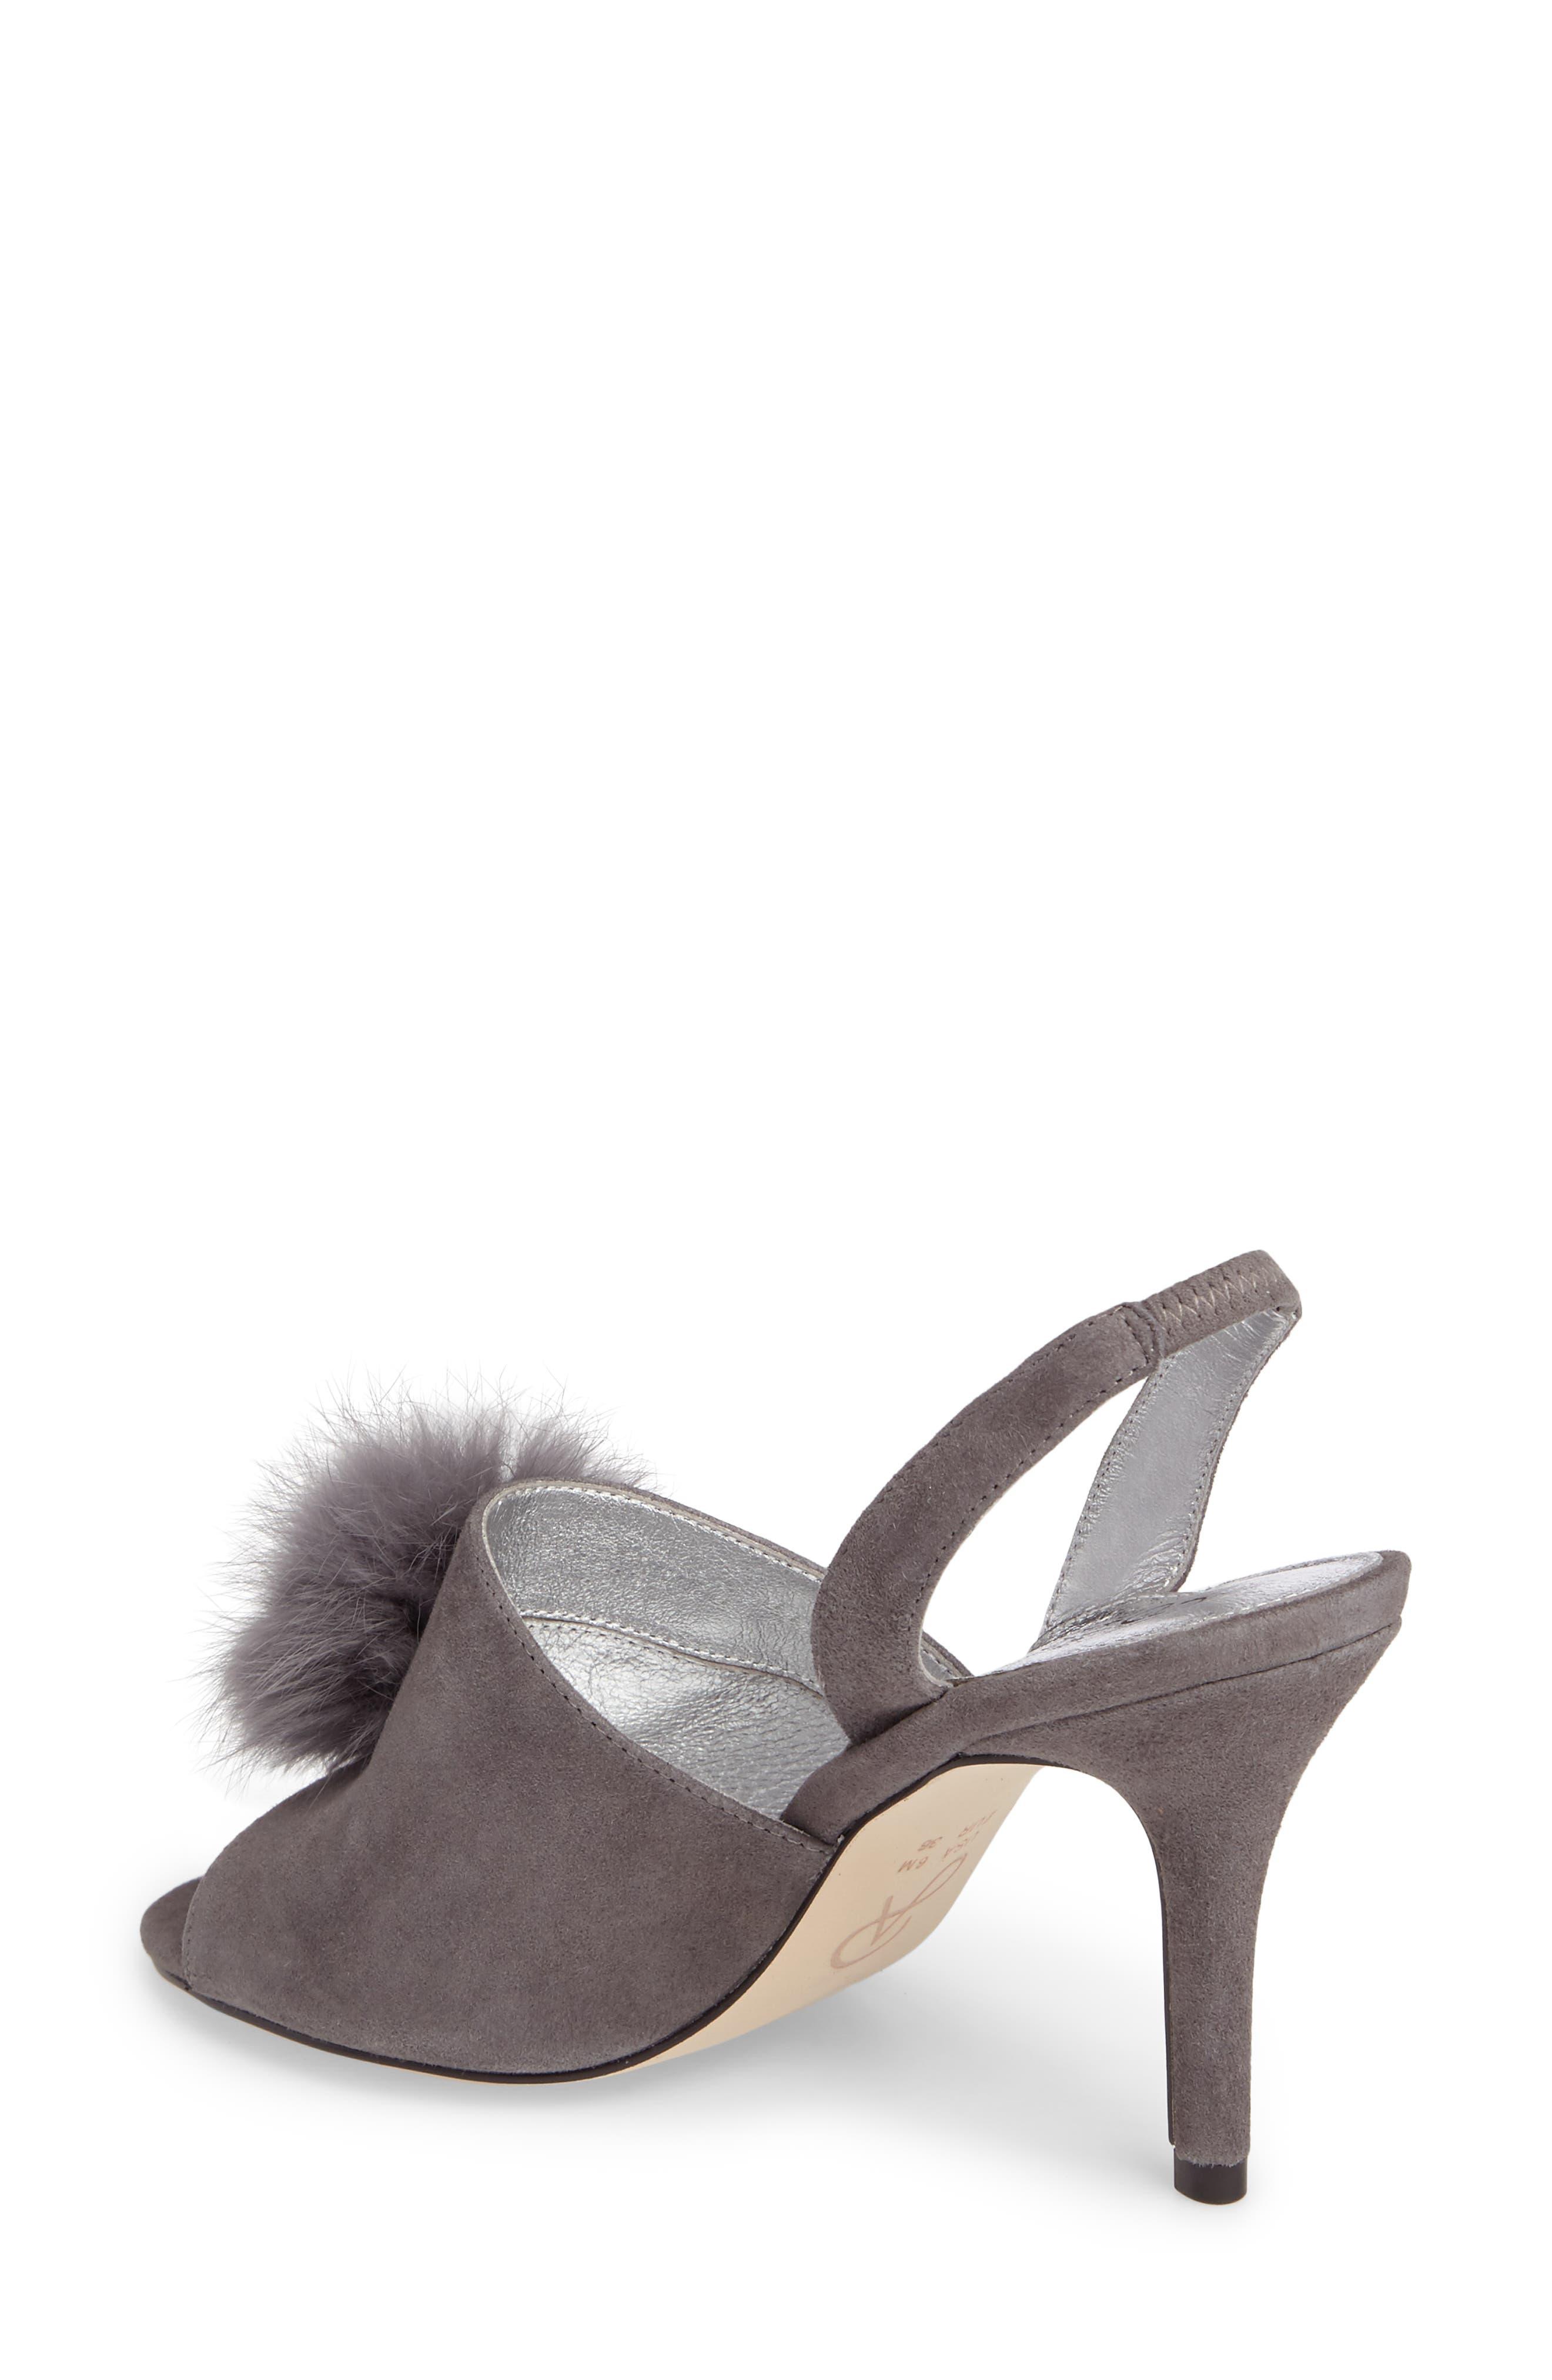 Alecia Genuine Rabbit Fur Pompom Sandal,                             Alternate thumbnail 4, color,